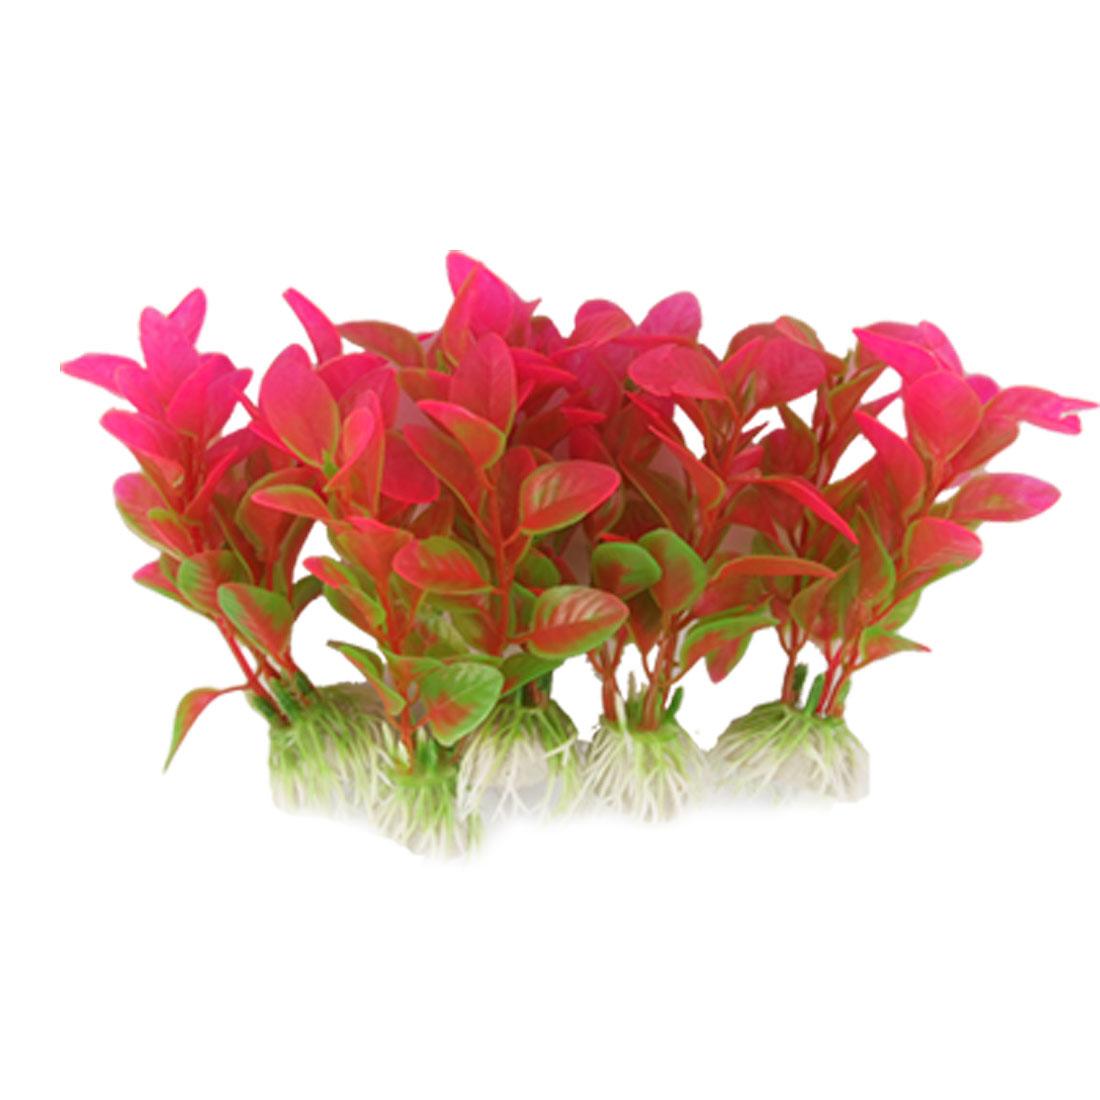 "5 Pcs 4.3"" High Pink Green Plastic Plant Decor for Fish Tank"